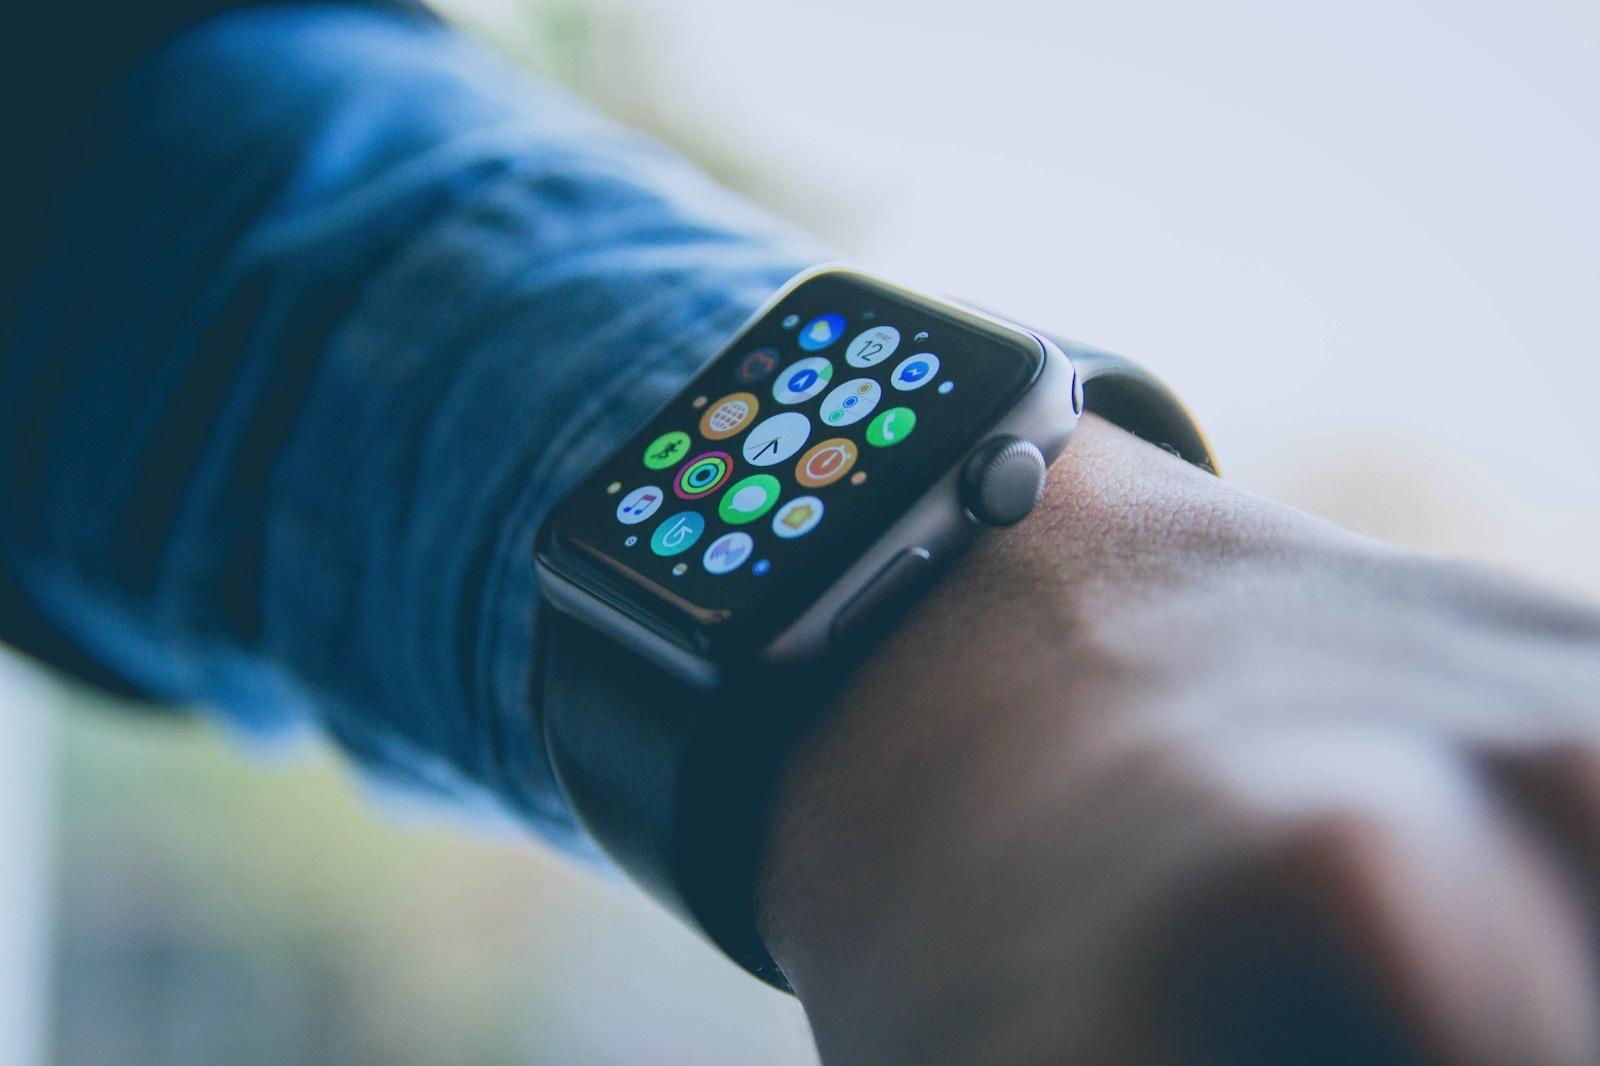 Alvaro reyes 700677 unsplash apple watch